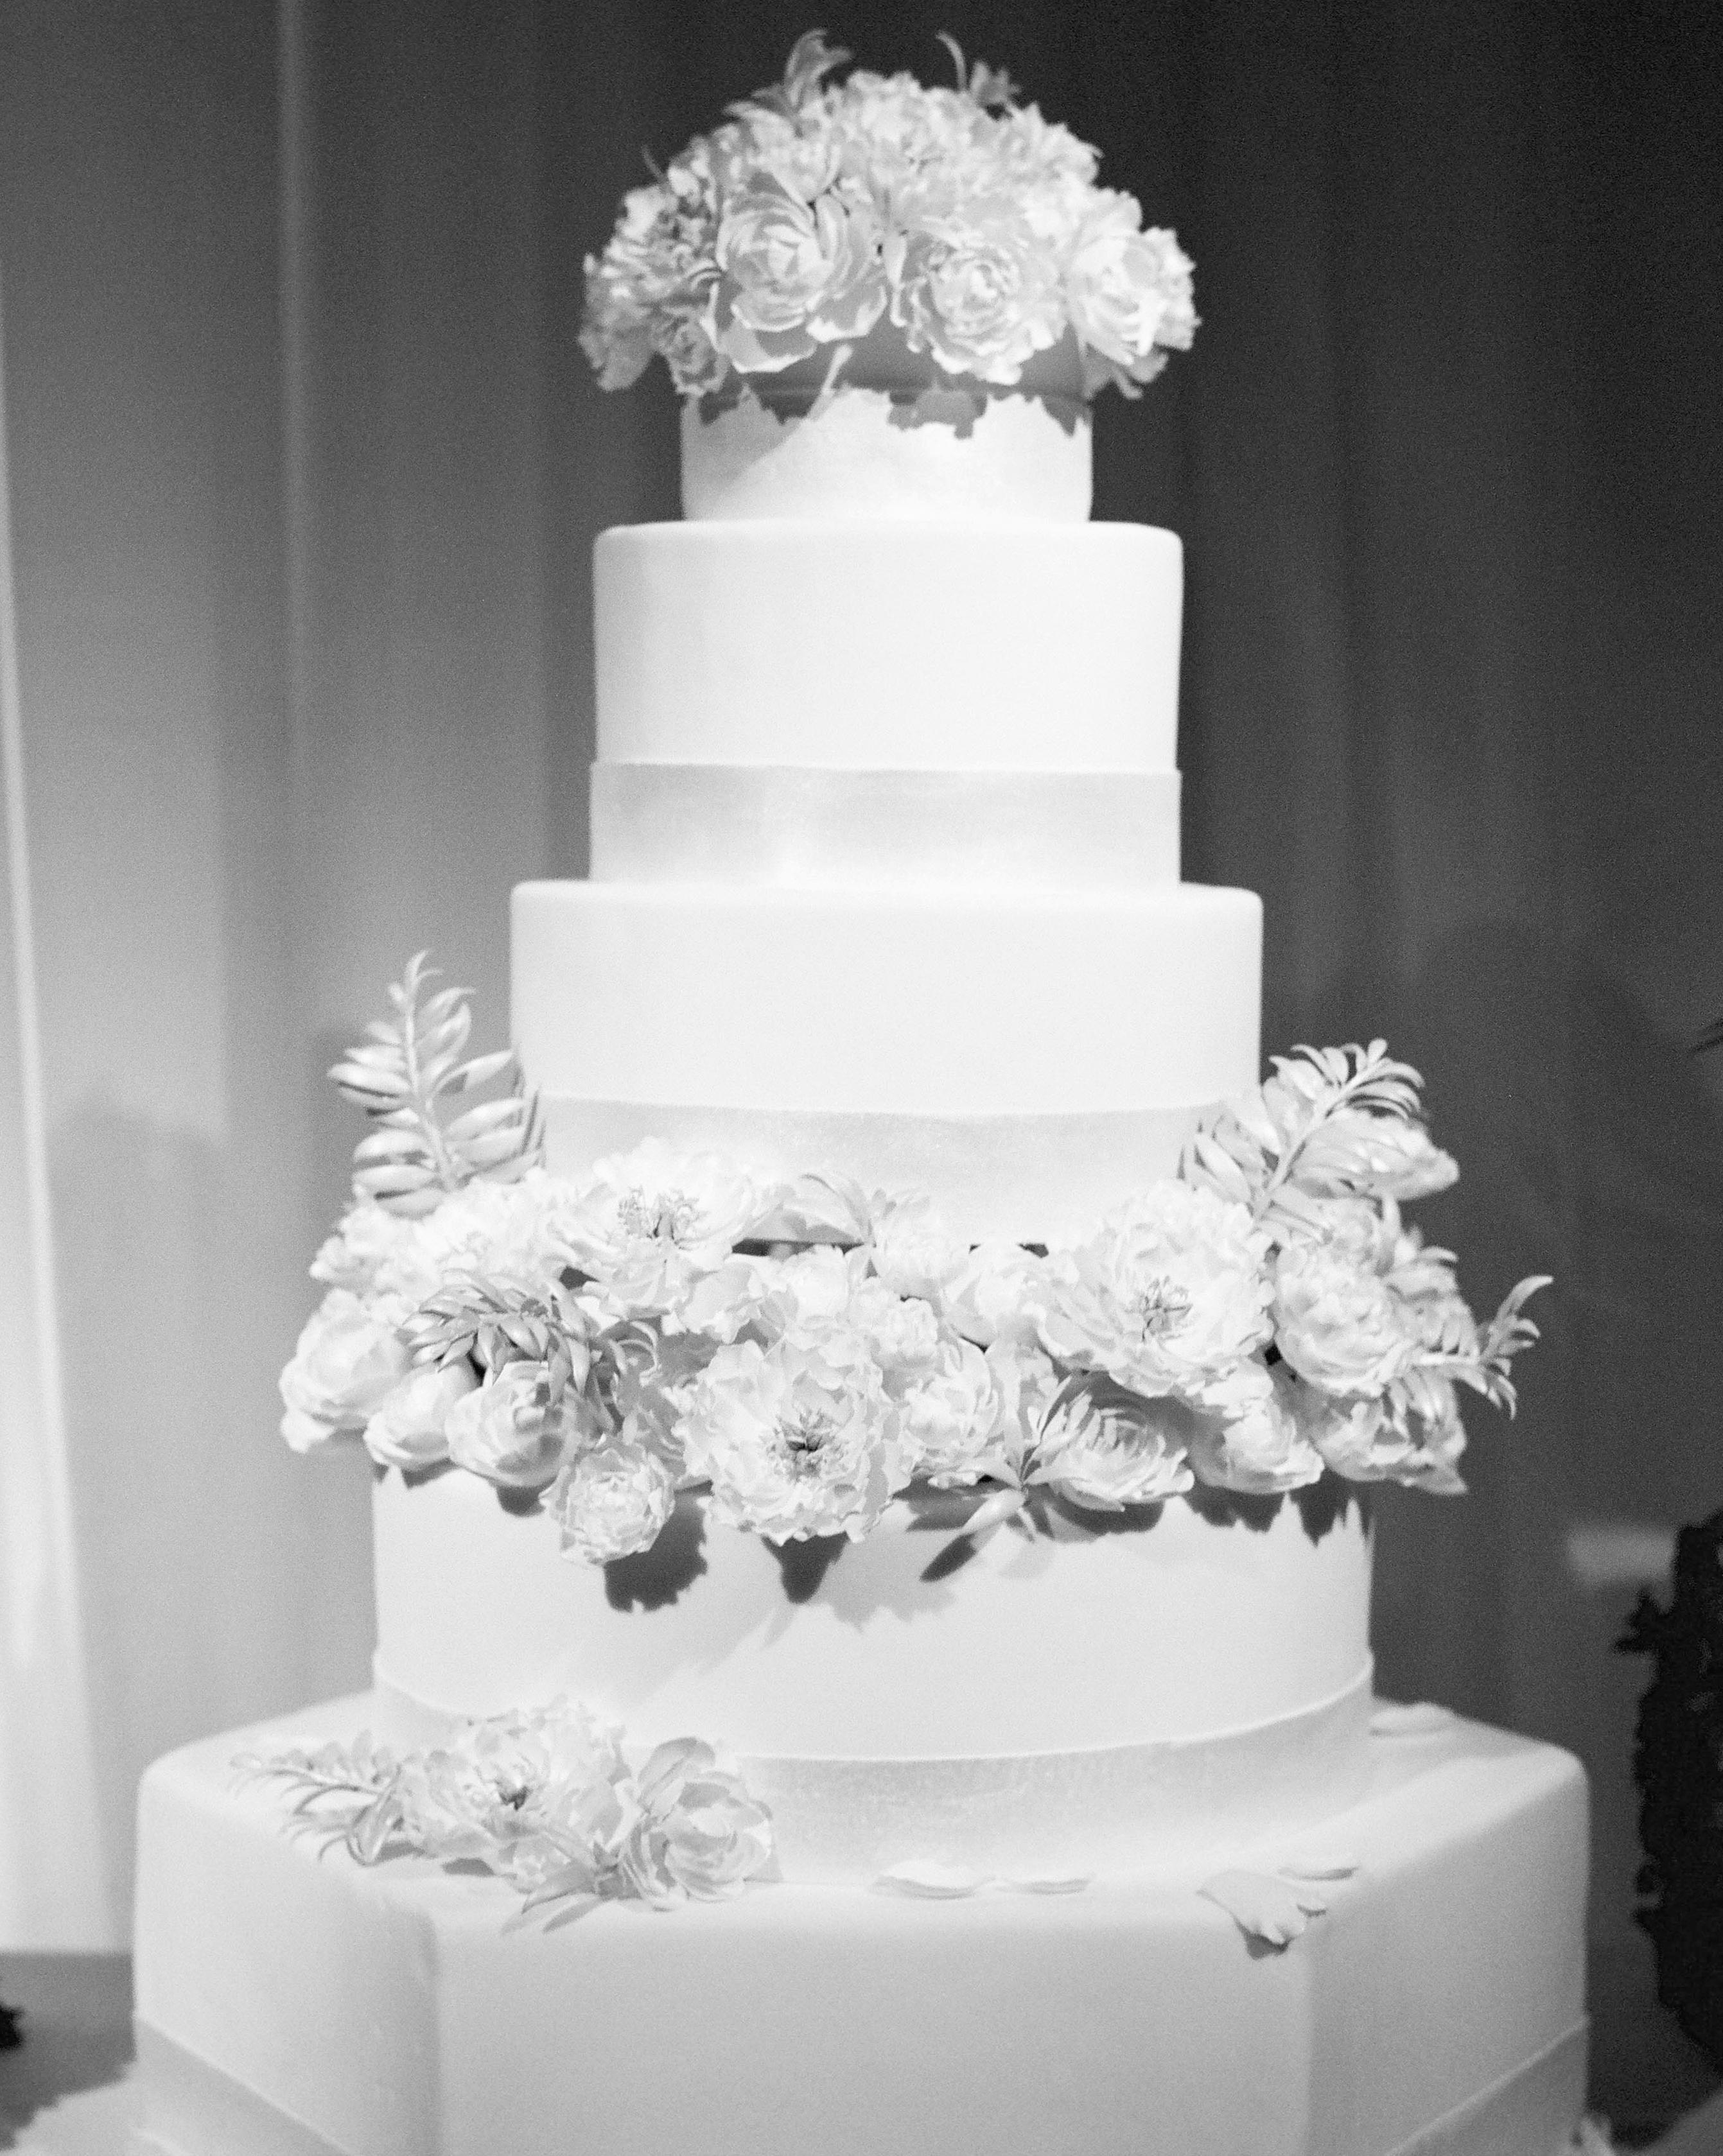 real-wedding-fall14-jojo-eric-159elizabeth-messina-ds111226-0814.jpg